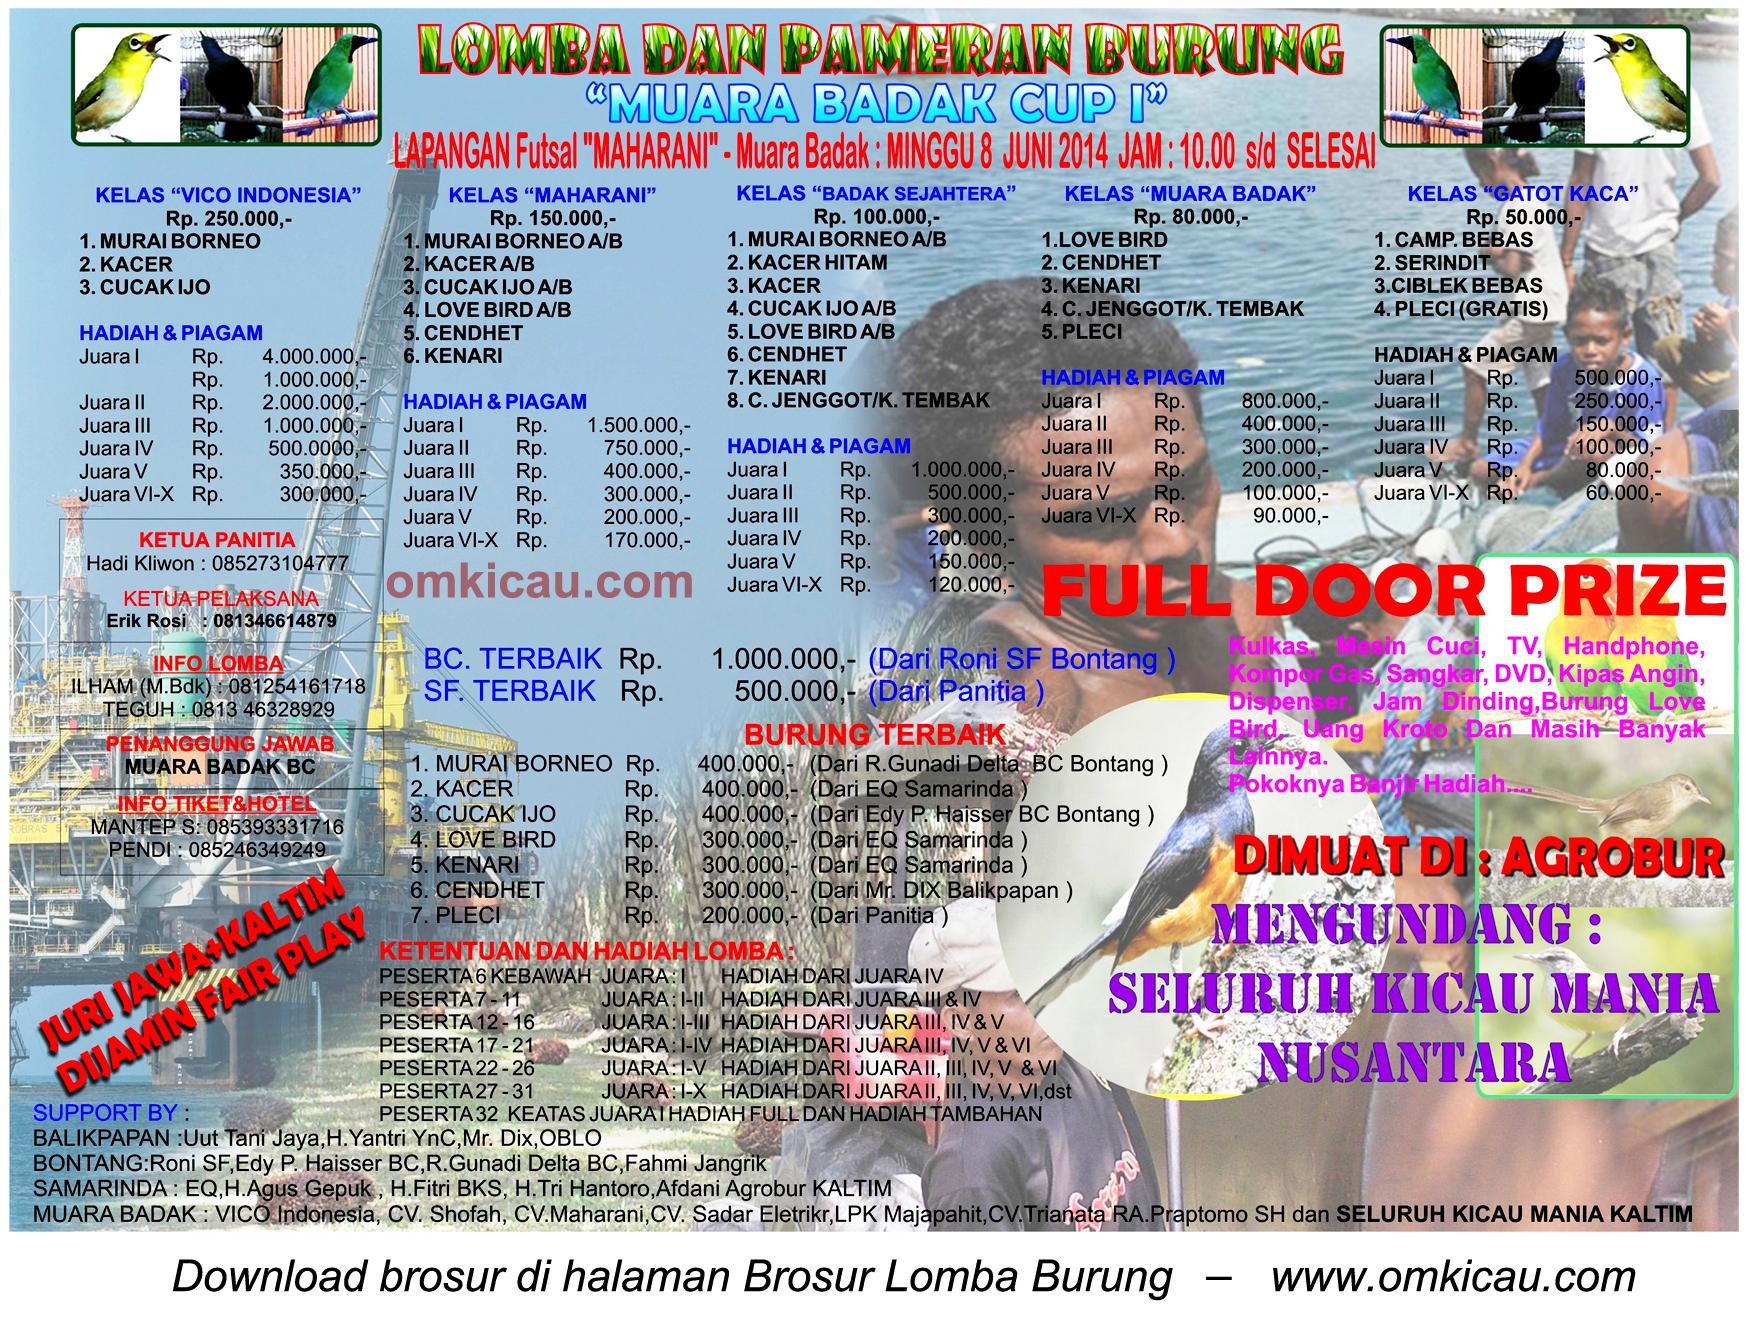 Brosur Lomba Burung Berkicau Muara Badak Cup I, Kutai Kartanegara, 8 Juni 2014